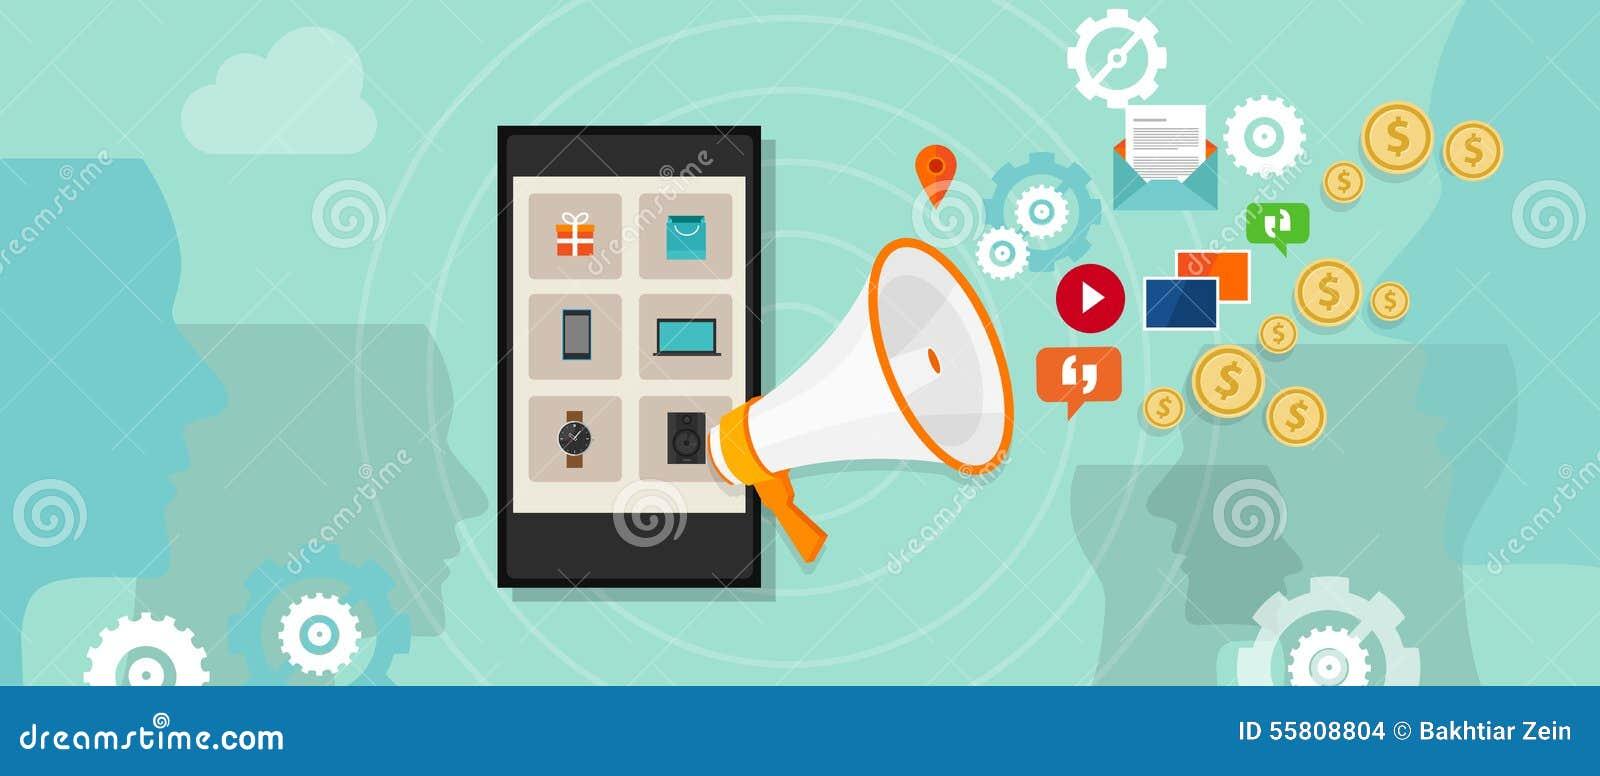 Internet Marketing Banner Flat Design Illustration Concept For Camera Circuit Board Promotiononline Shopping Promotional Paid Promotion Online Advertising Digital Vector